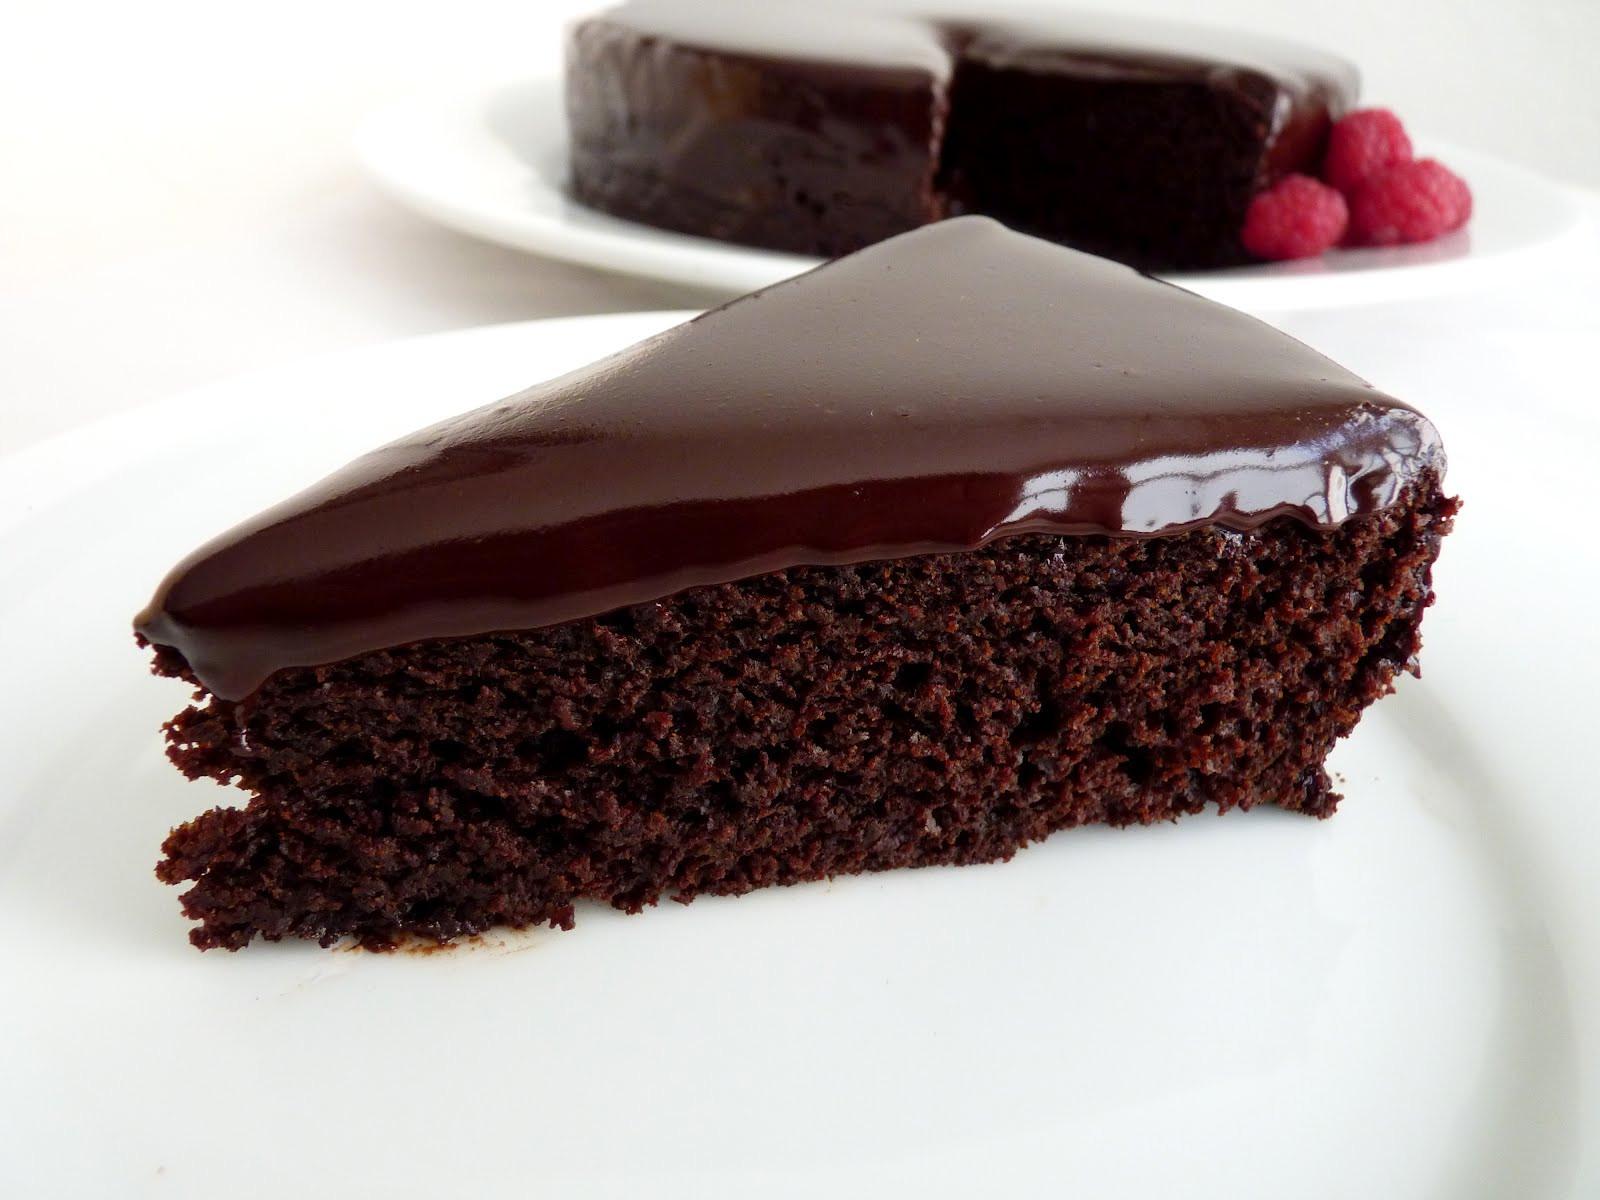 Chocolate Cake Ingredients  pastry studio Double Chocolate Cake